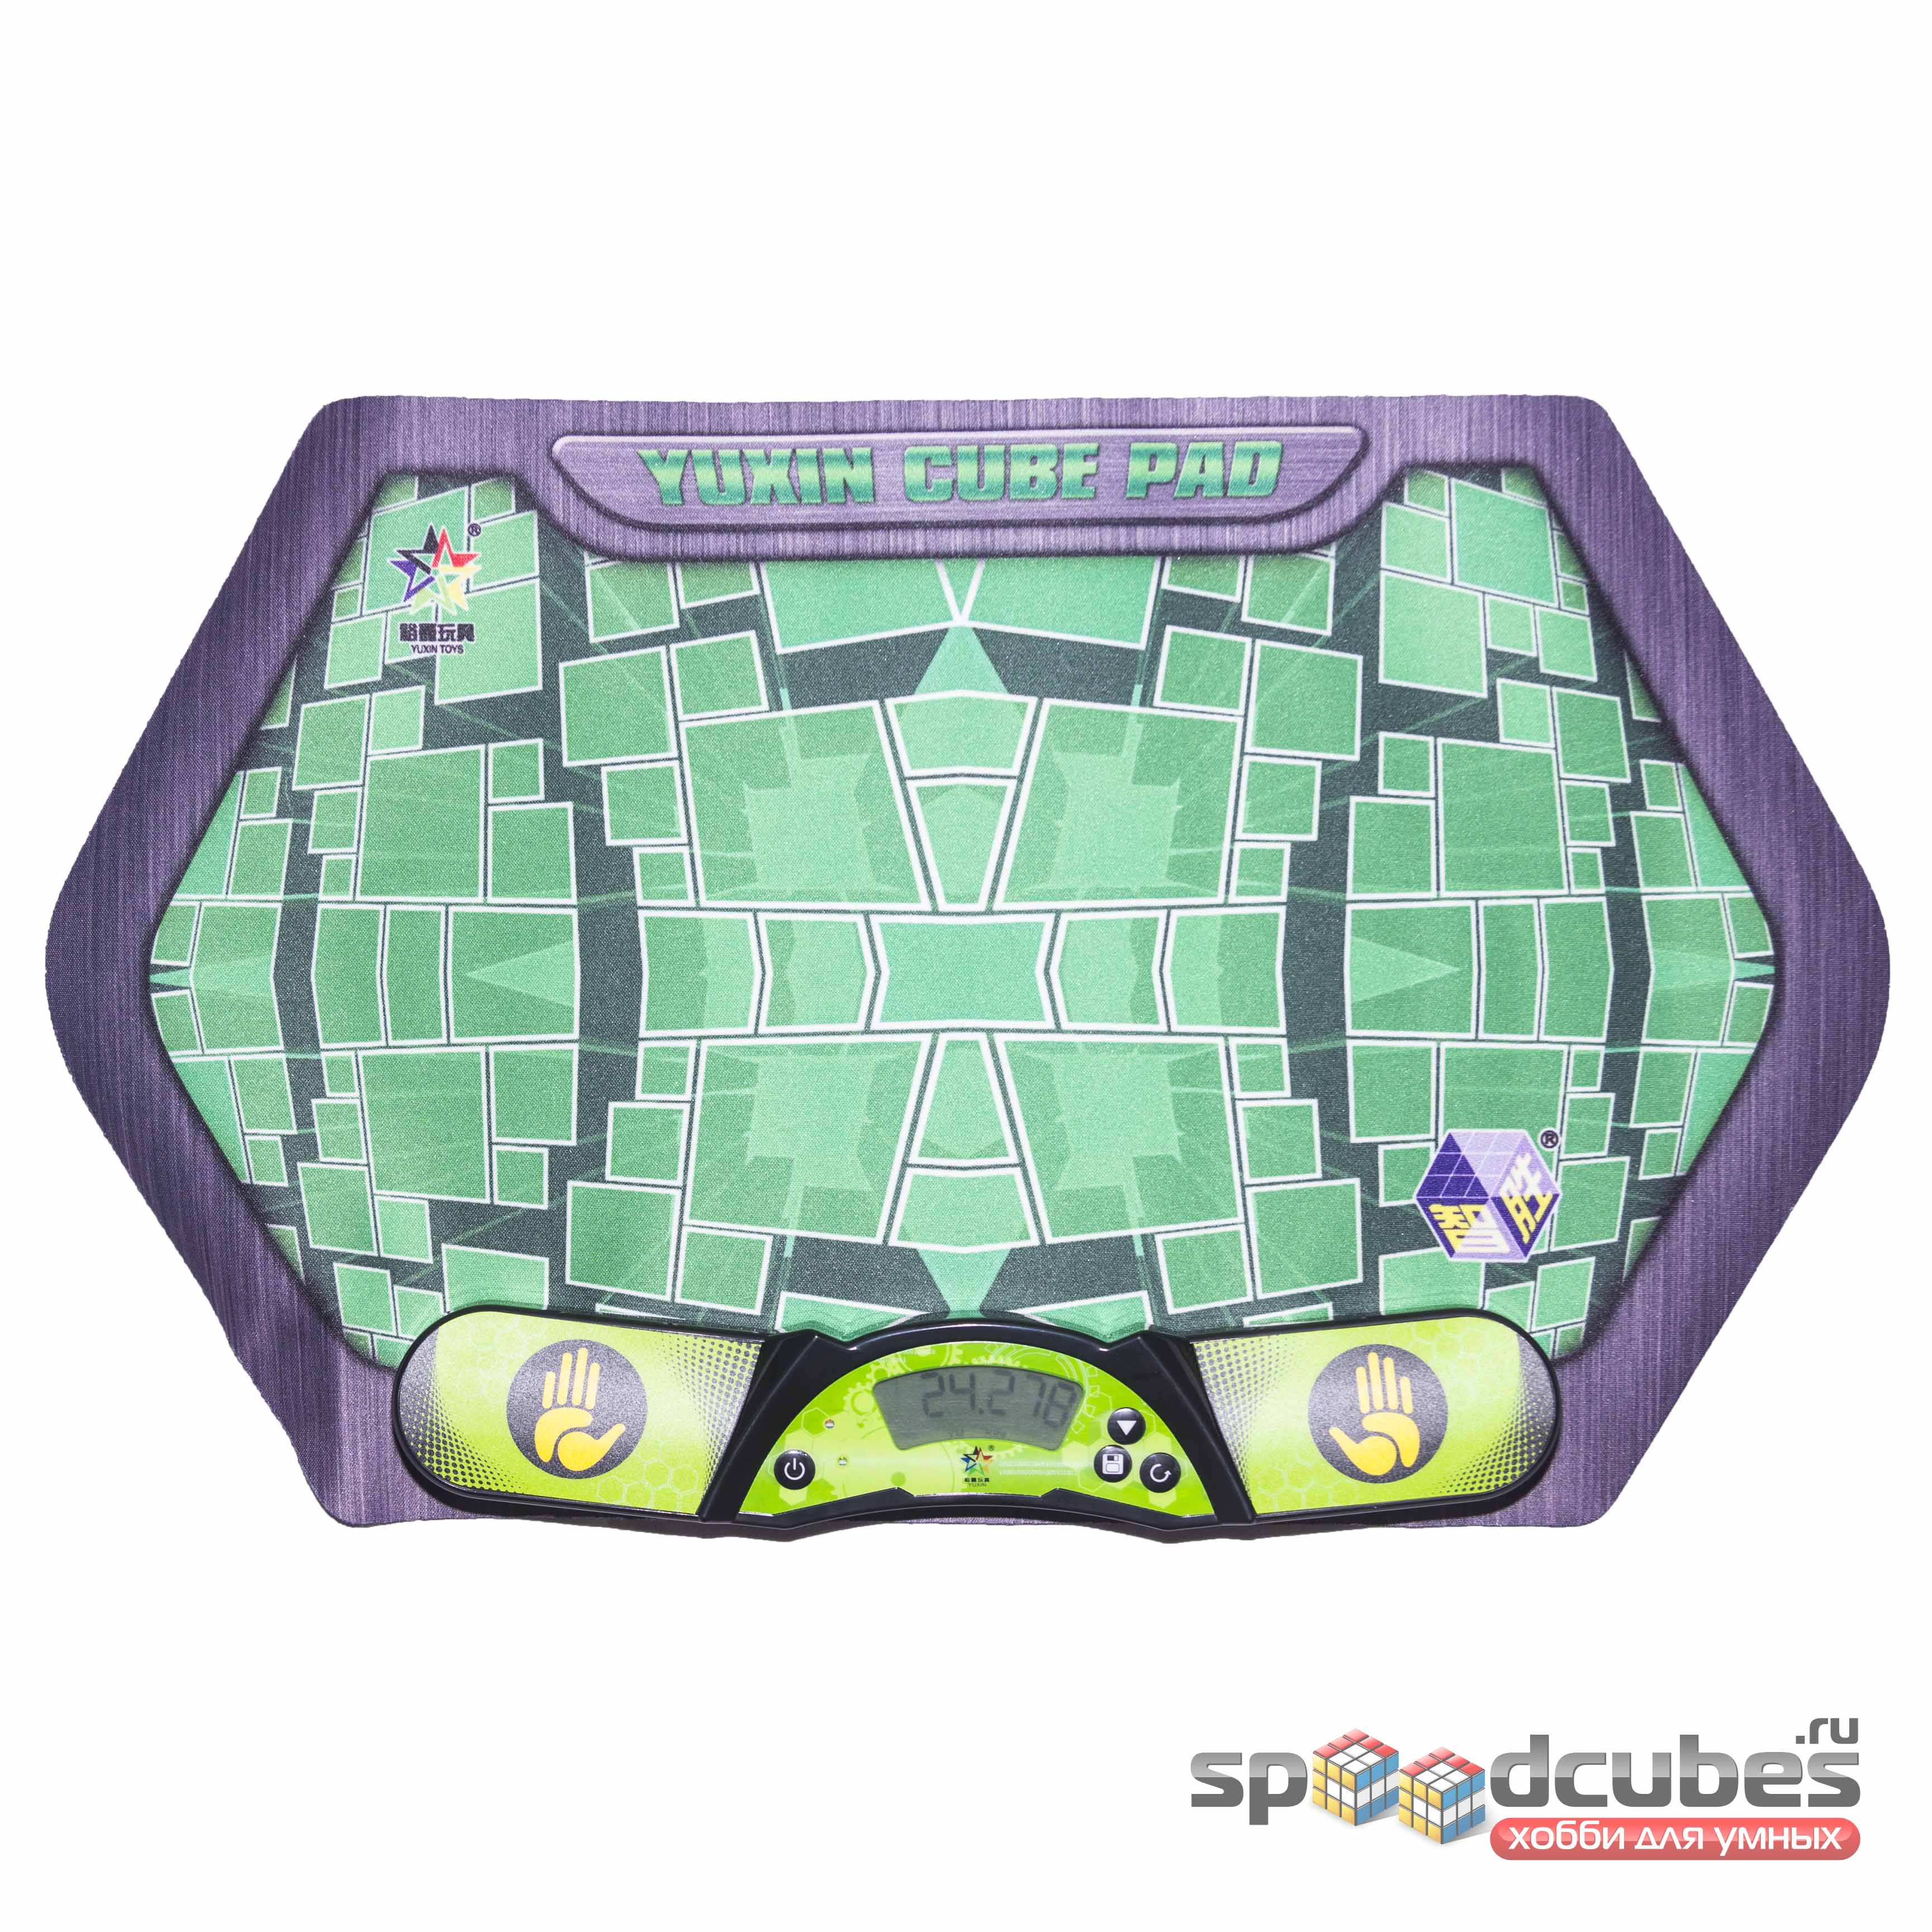 Yuxin Cube Pad мат для спидкубинга и таймер Yuxin V2